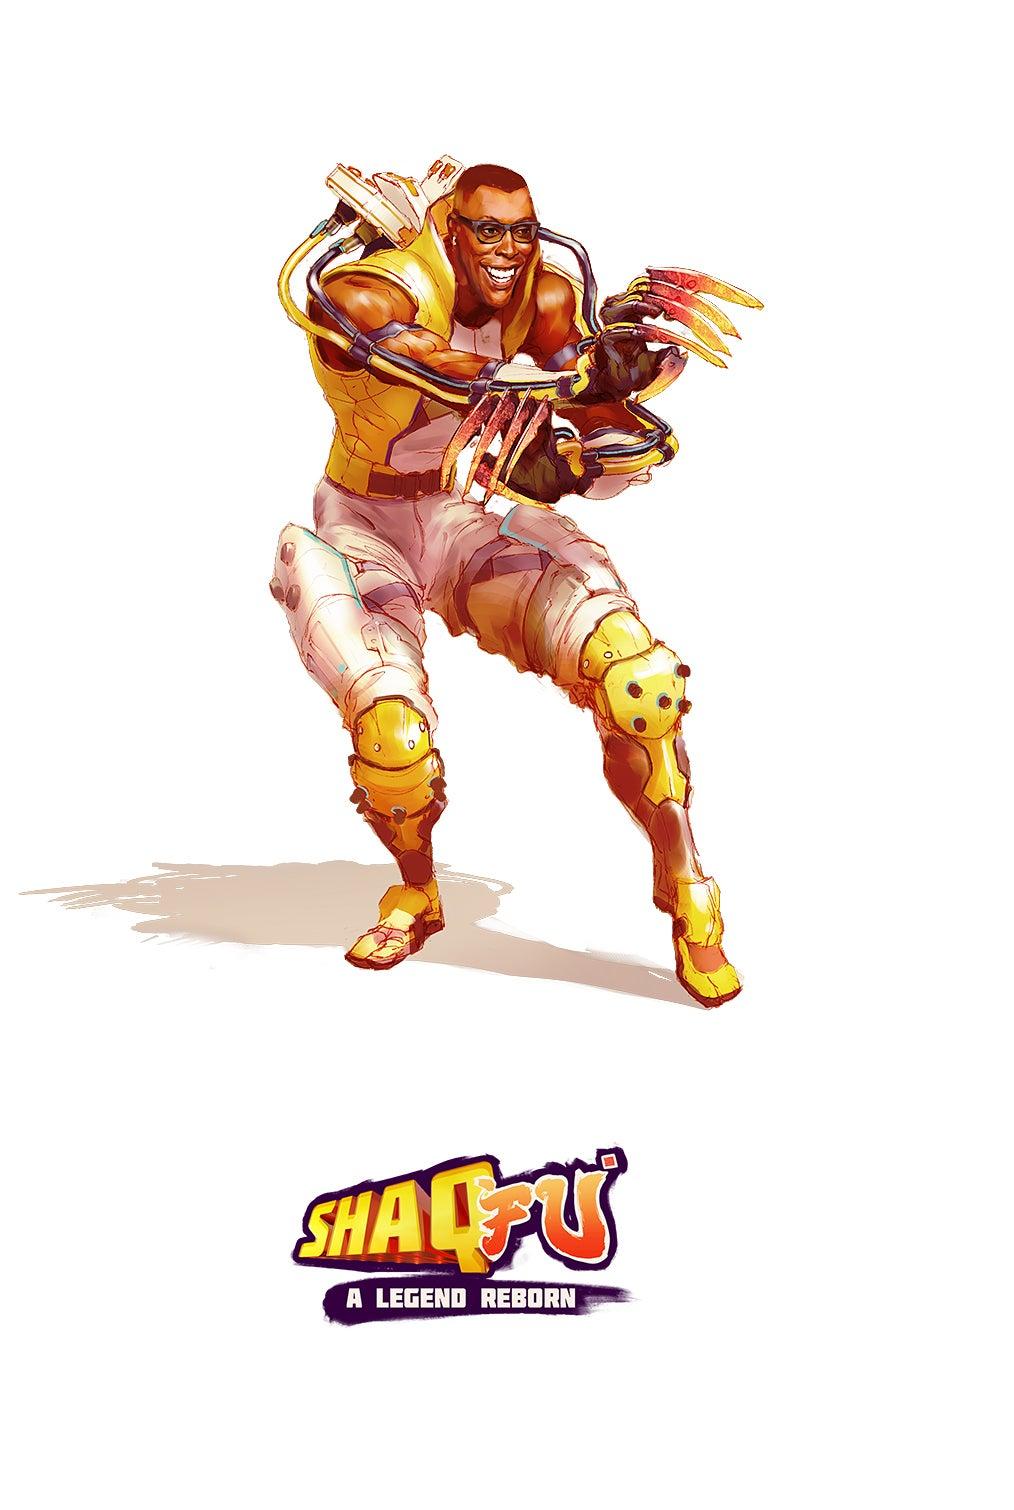 Shaq-Fu 2 Is Happening